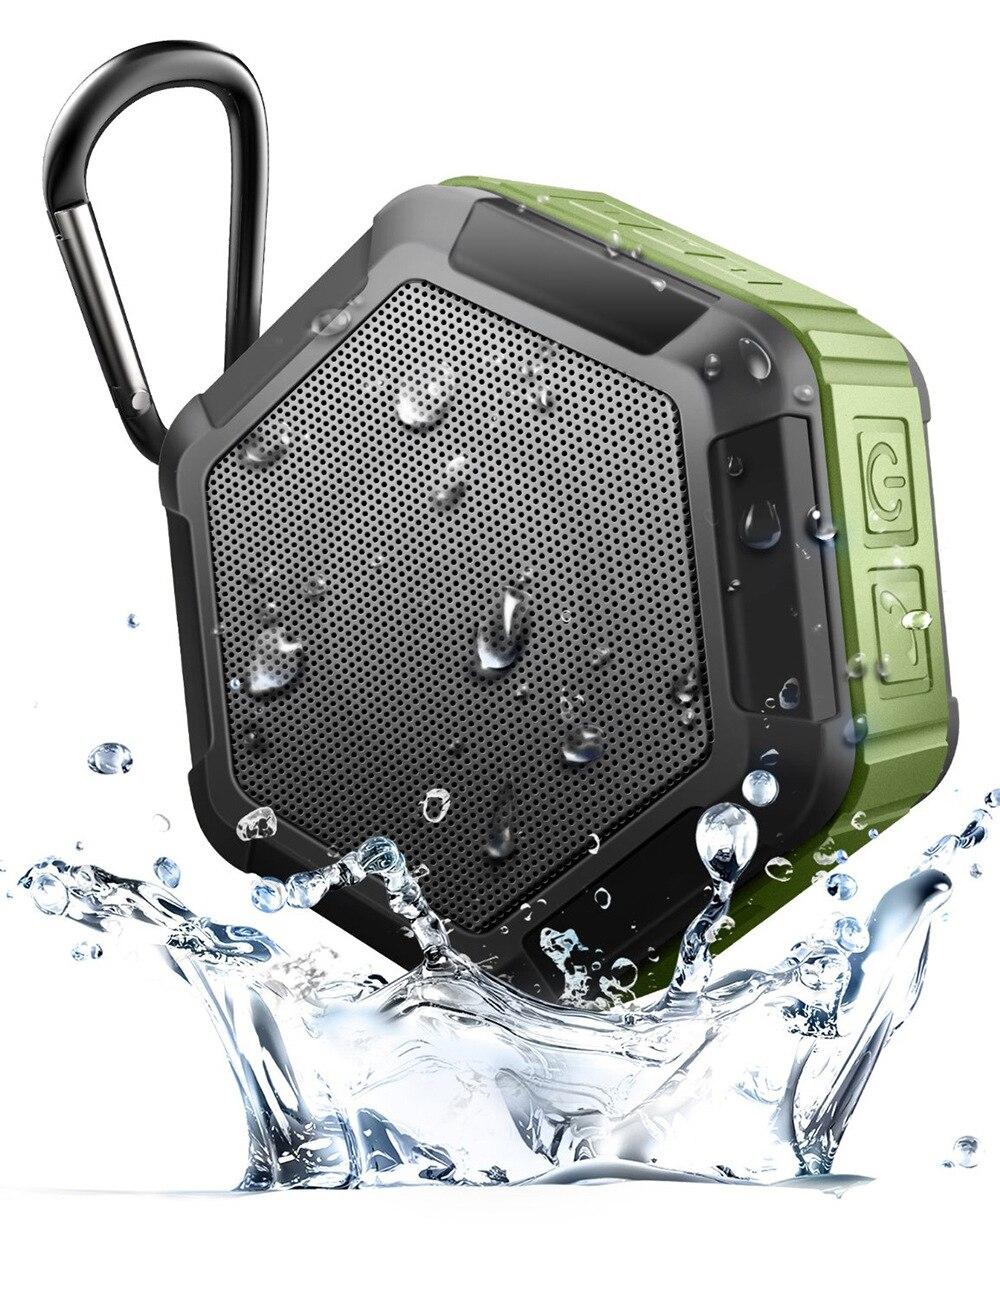 Waterproof <font><b>Bluetooth</b></font> <font><b>Speaker</b></font> Mini Portable Wireless <font><b>Speaker</b></font> with Microphone for Travel, Ri Outdoor and Indoor <font><b>activities</b></font>